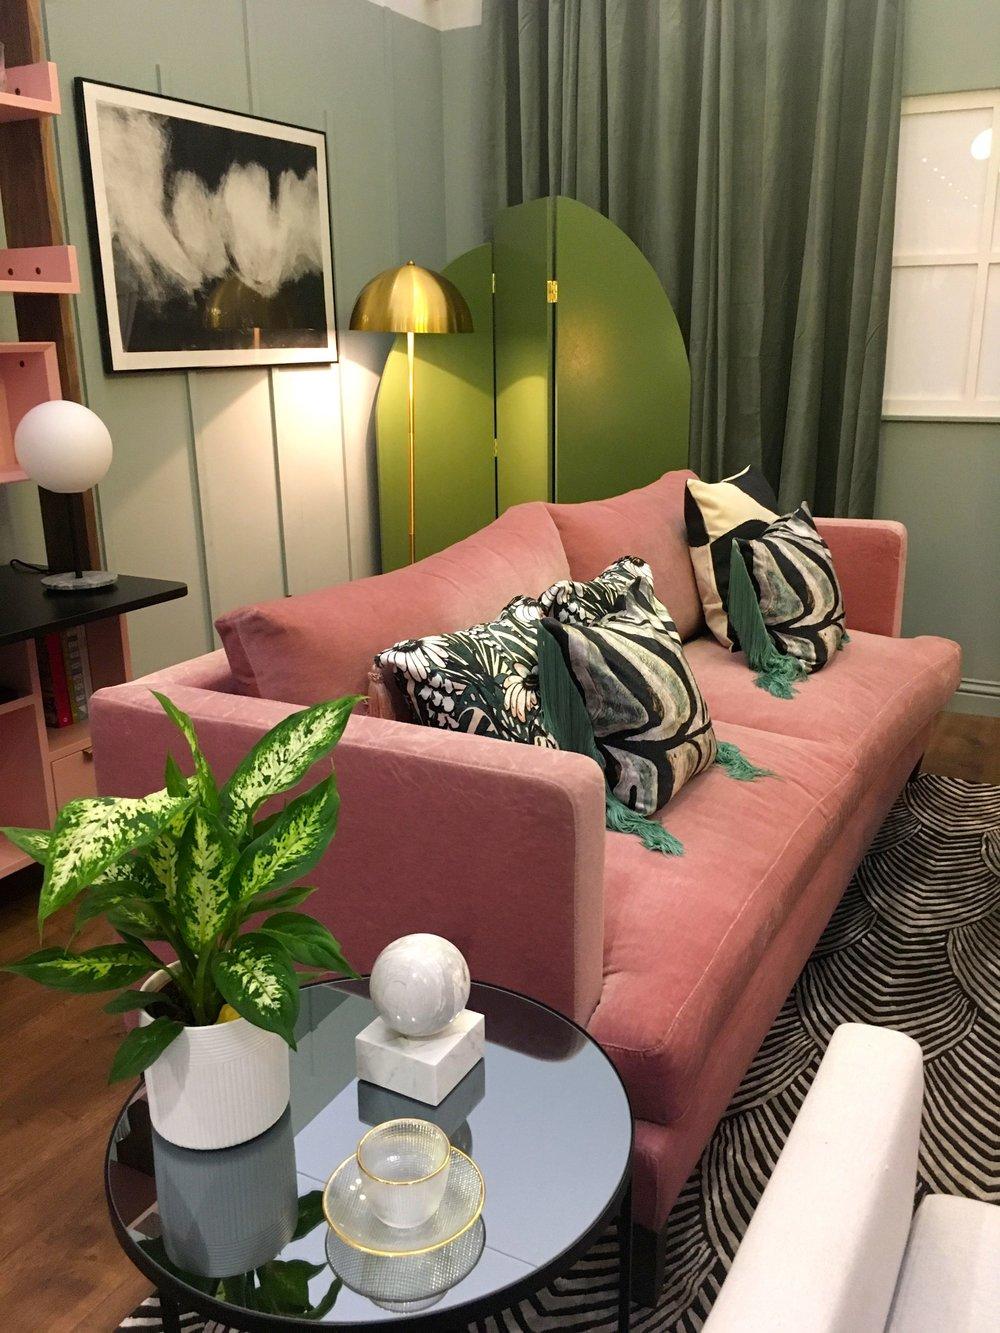 Dusky pink, prints and geometric designs